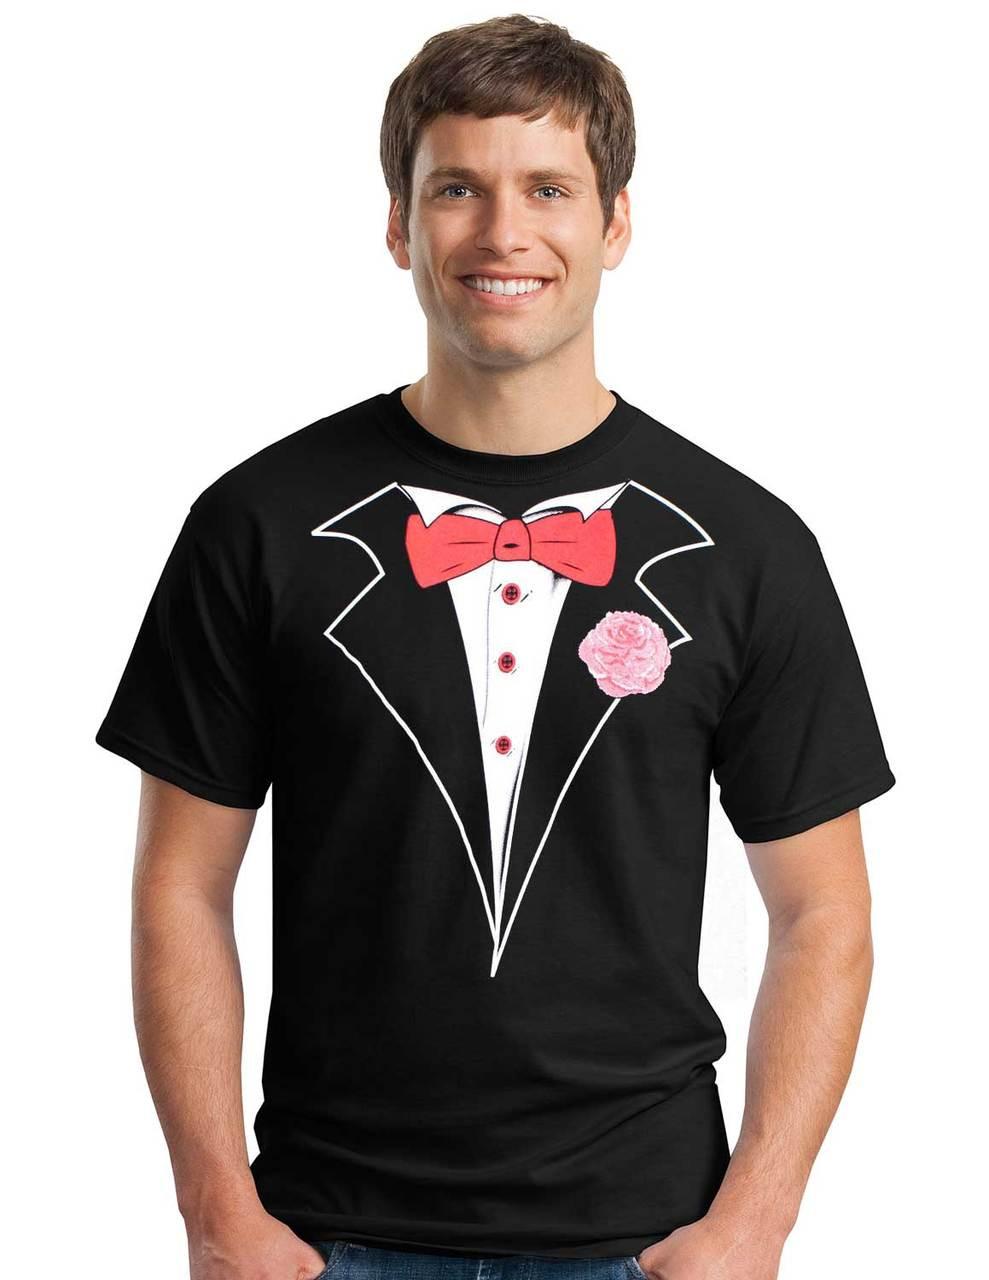 2b2ad4bdc Tuxedo T-shirt in Black - Classic   Shop Men's Tuxedo Tees